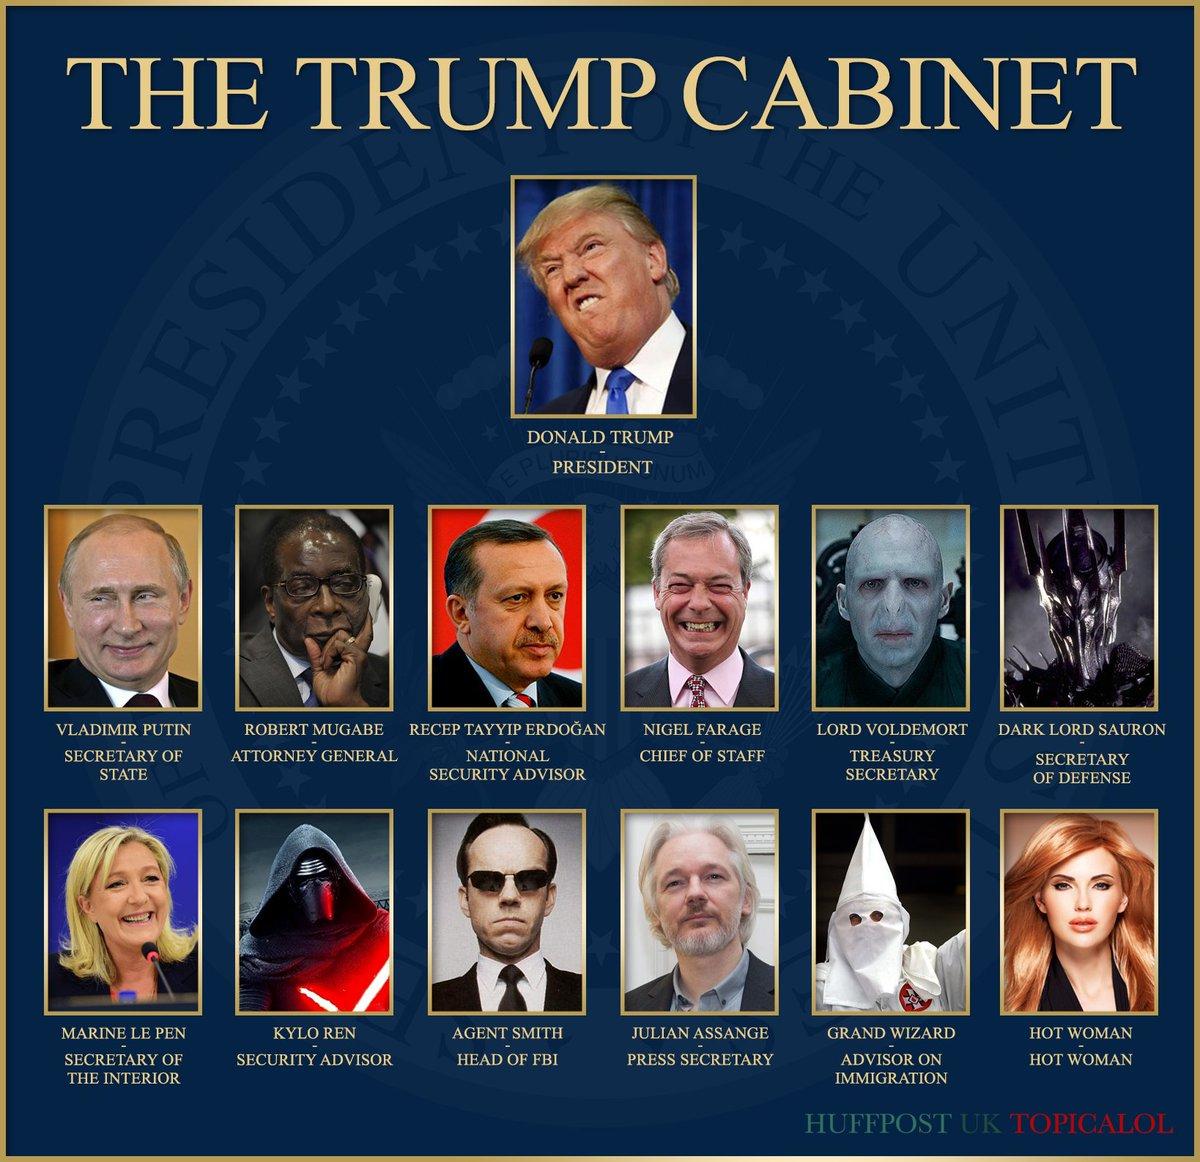 #TrumpPresident: Trump President